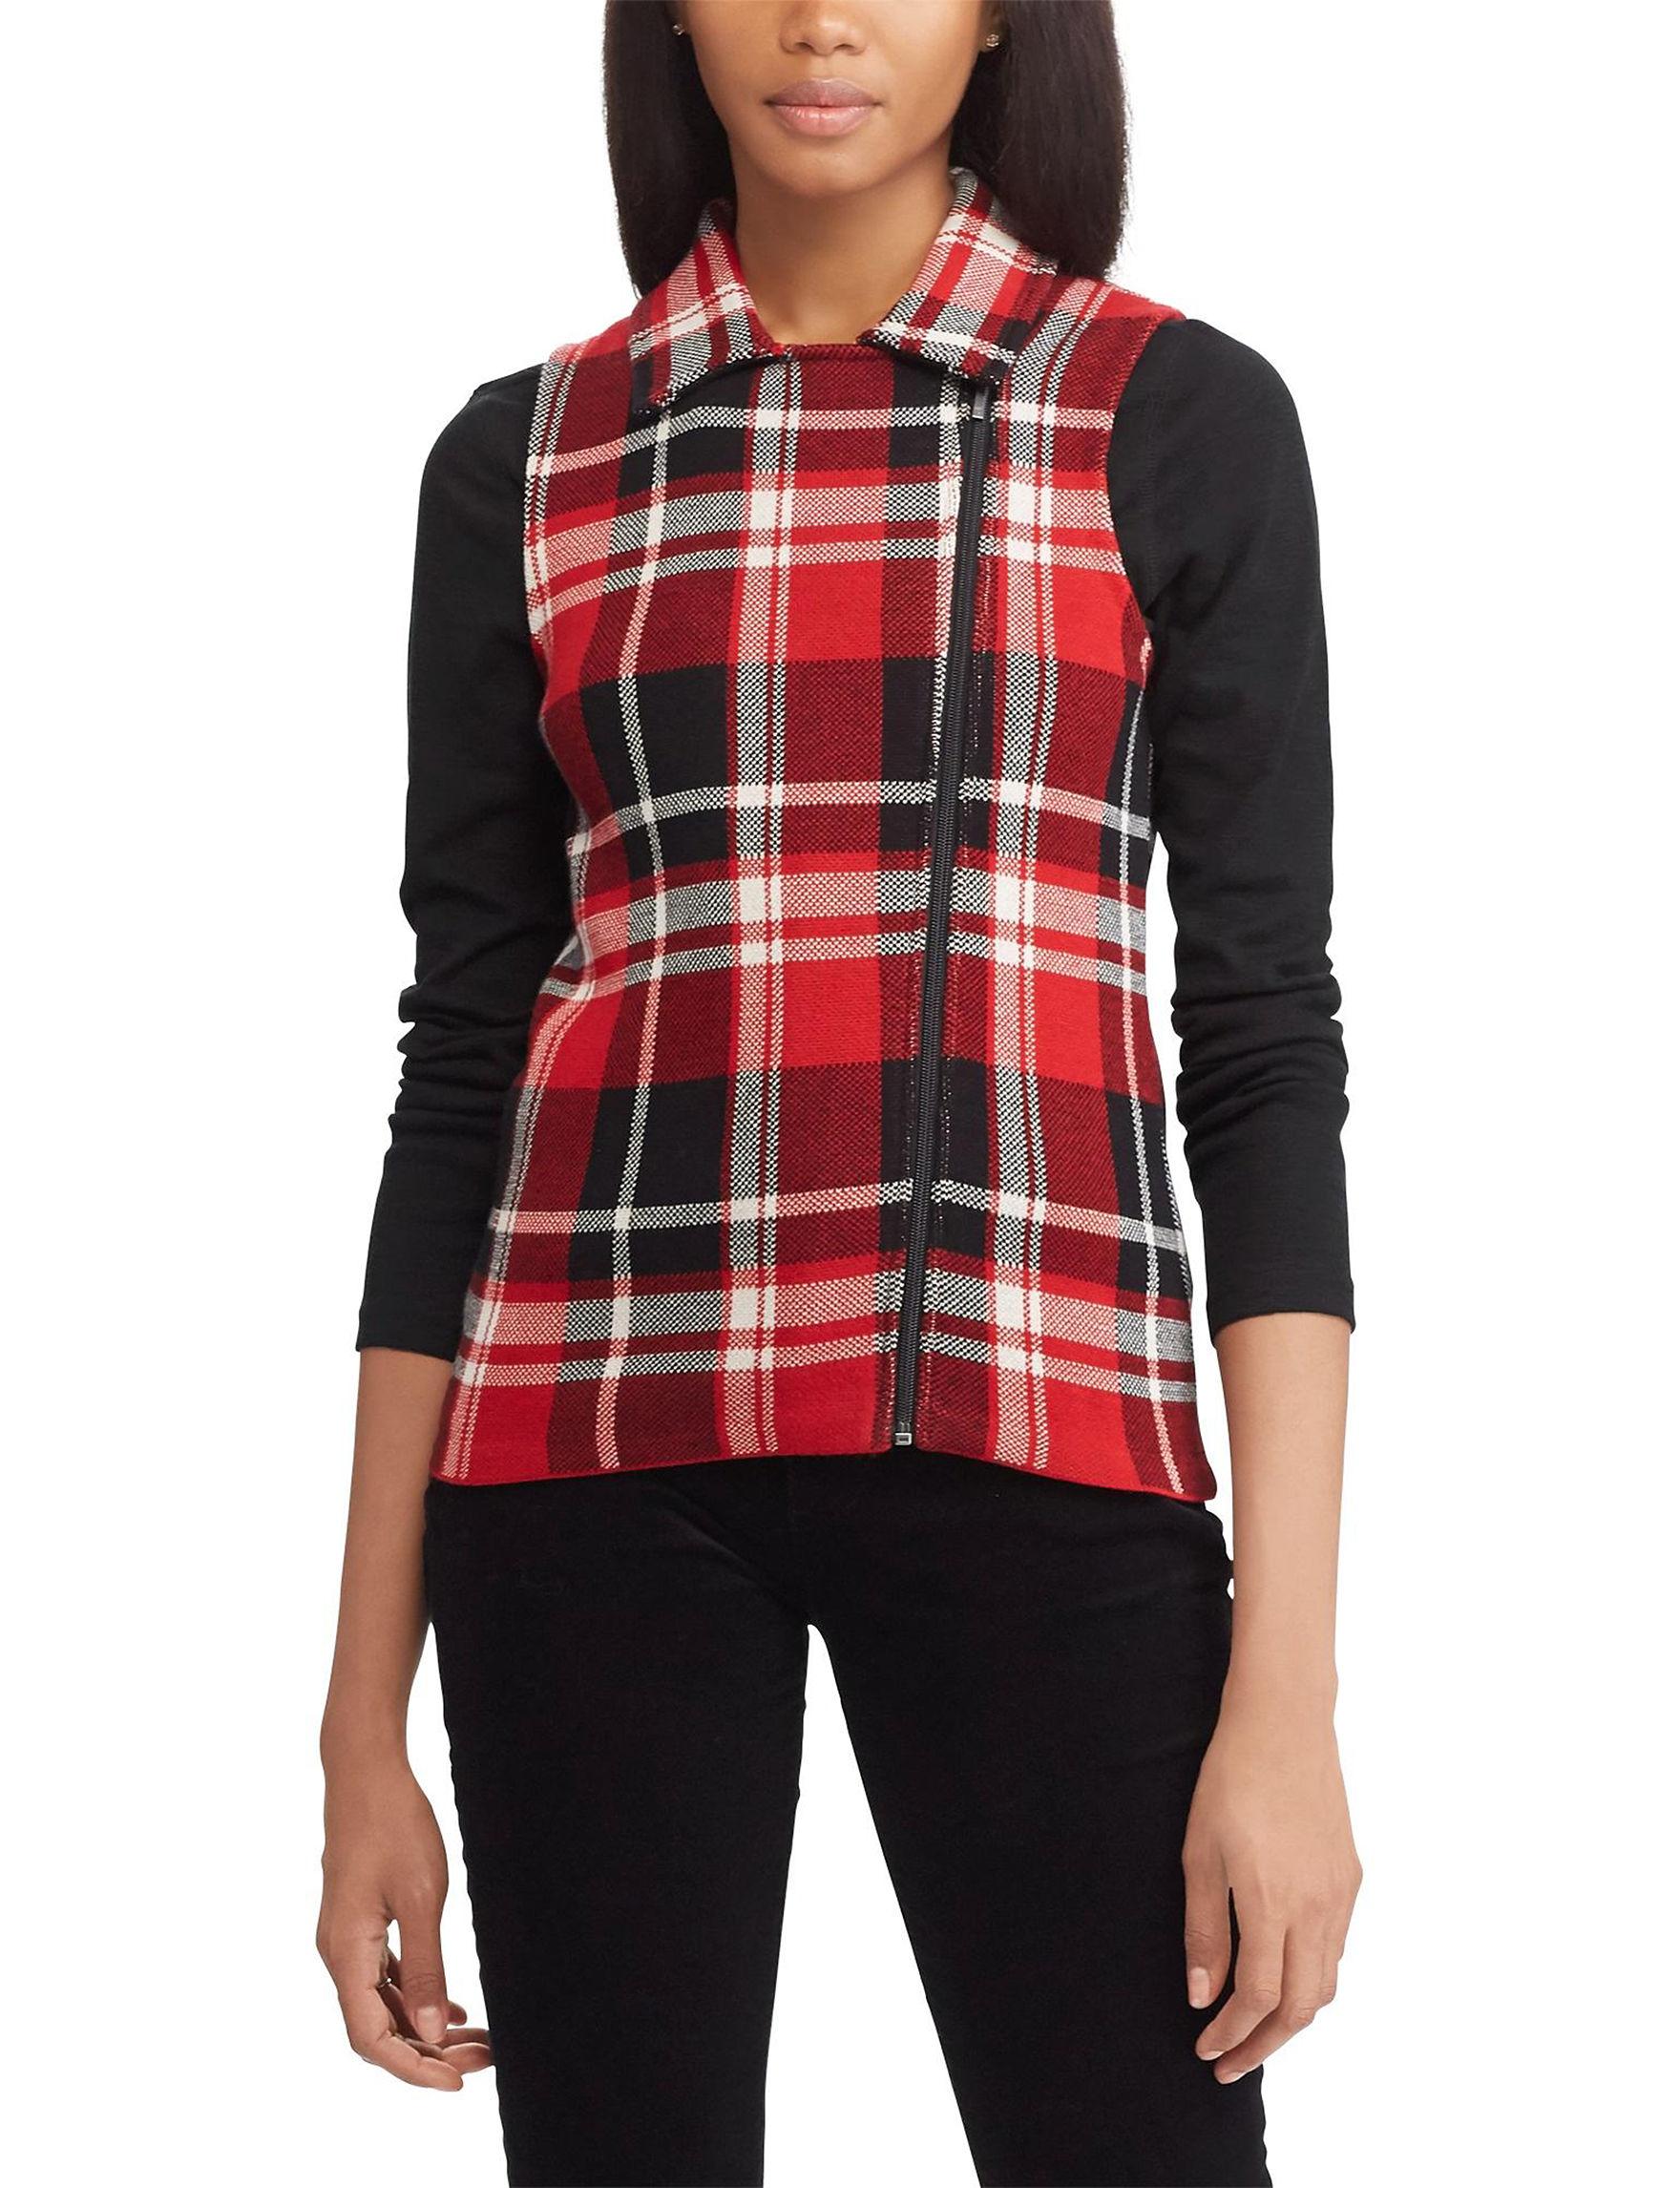 Chaps Red Lightweight Jackets & Blazers